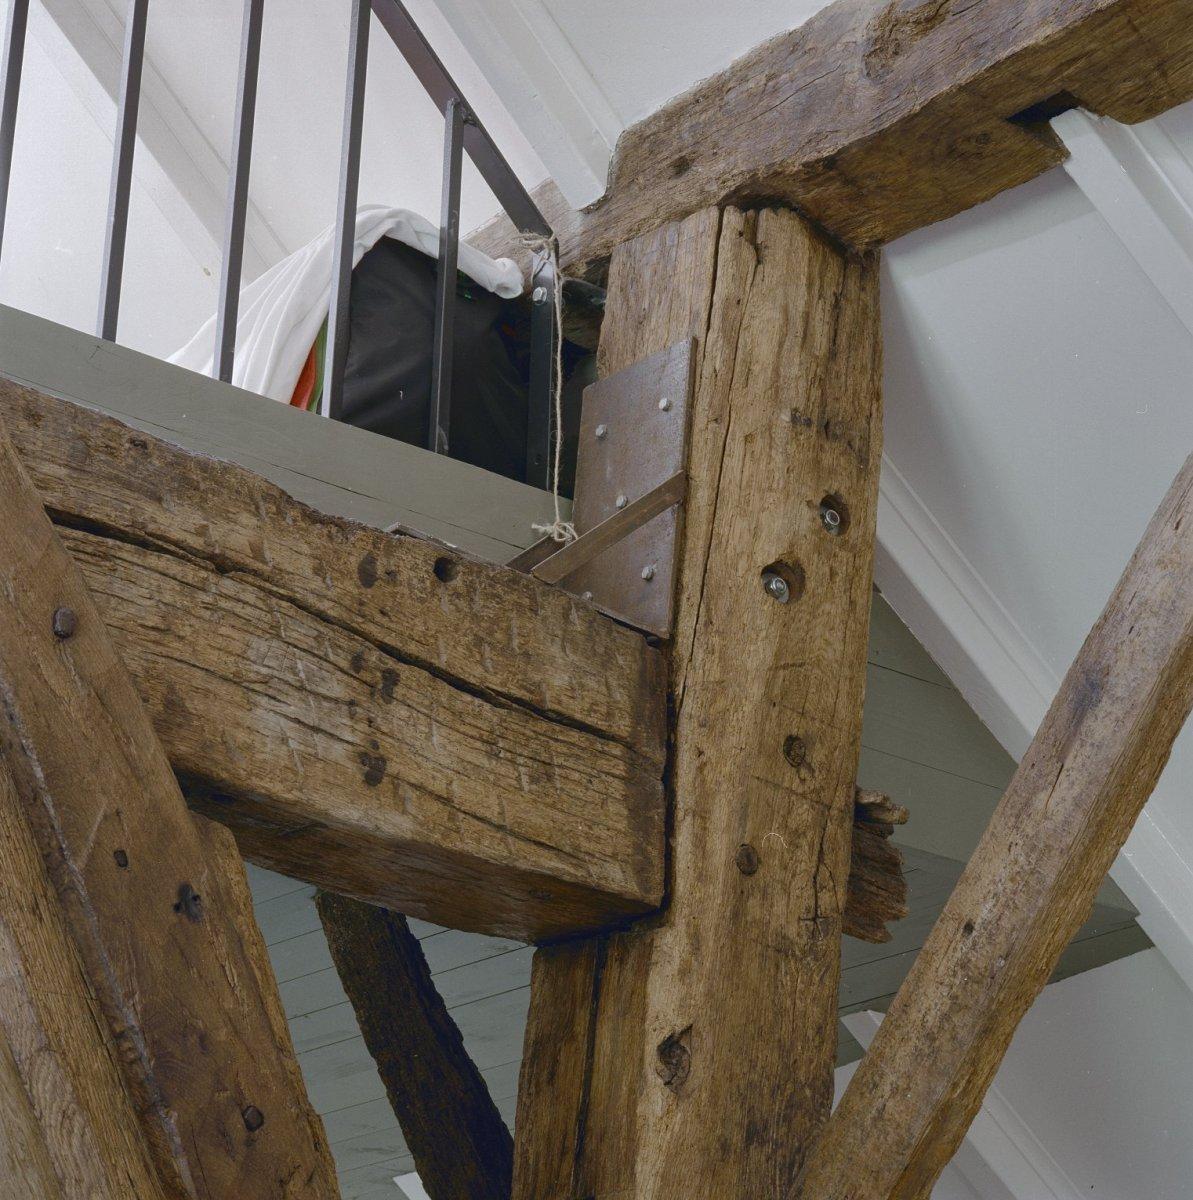 File interieur voormalige potstal nu woonkamer ijzeren for Interieur woonkamer